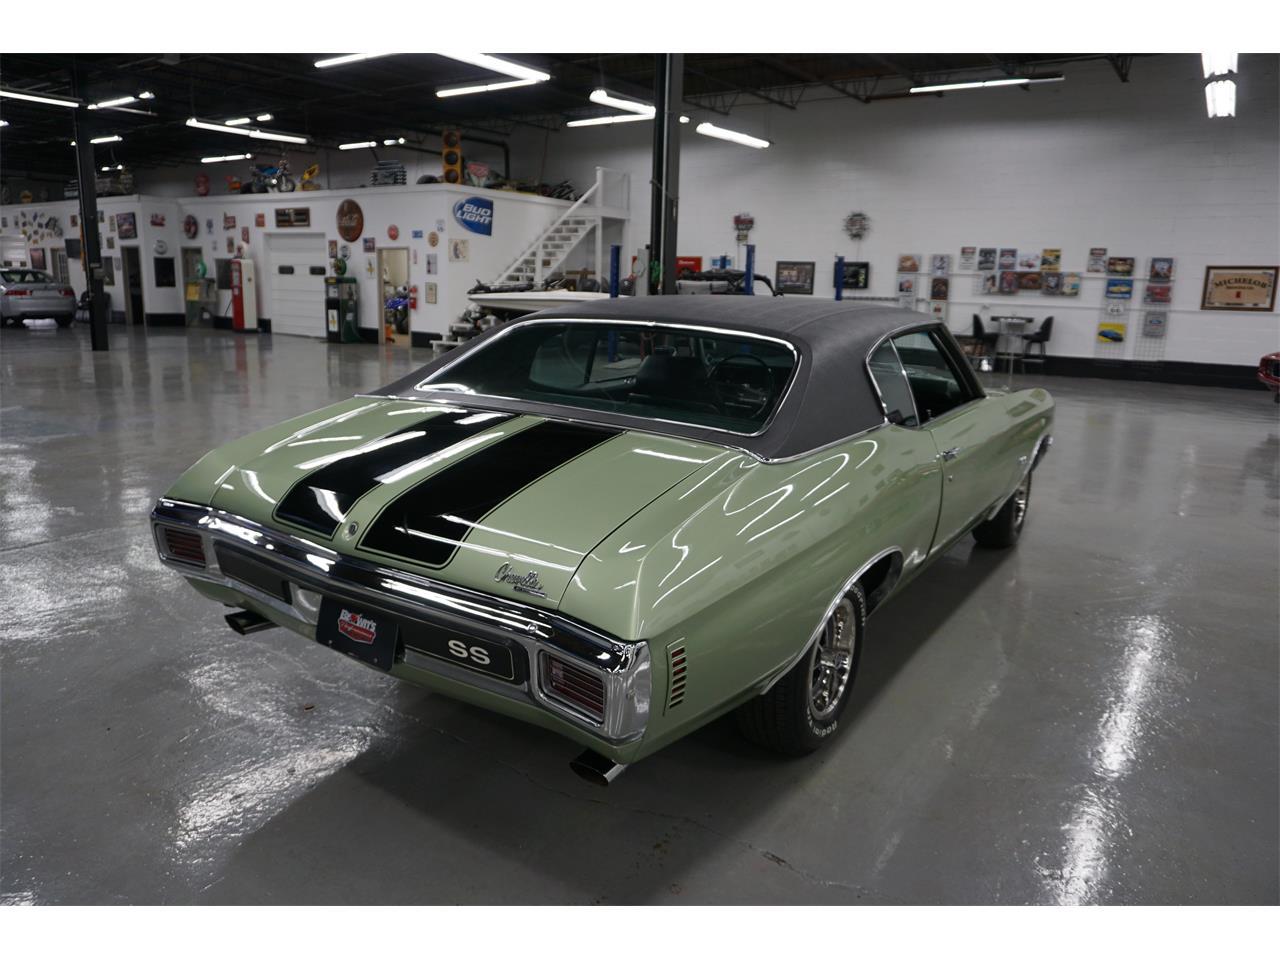 Large Picture of 1970 Chevrolet Chevelle - $55,900.00 - QN0Q